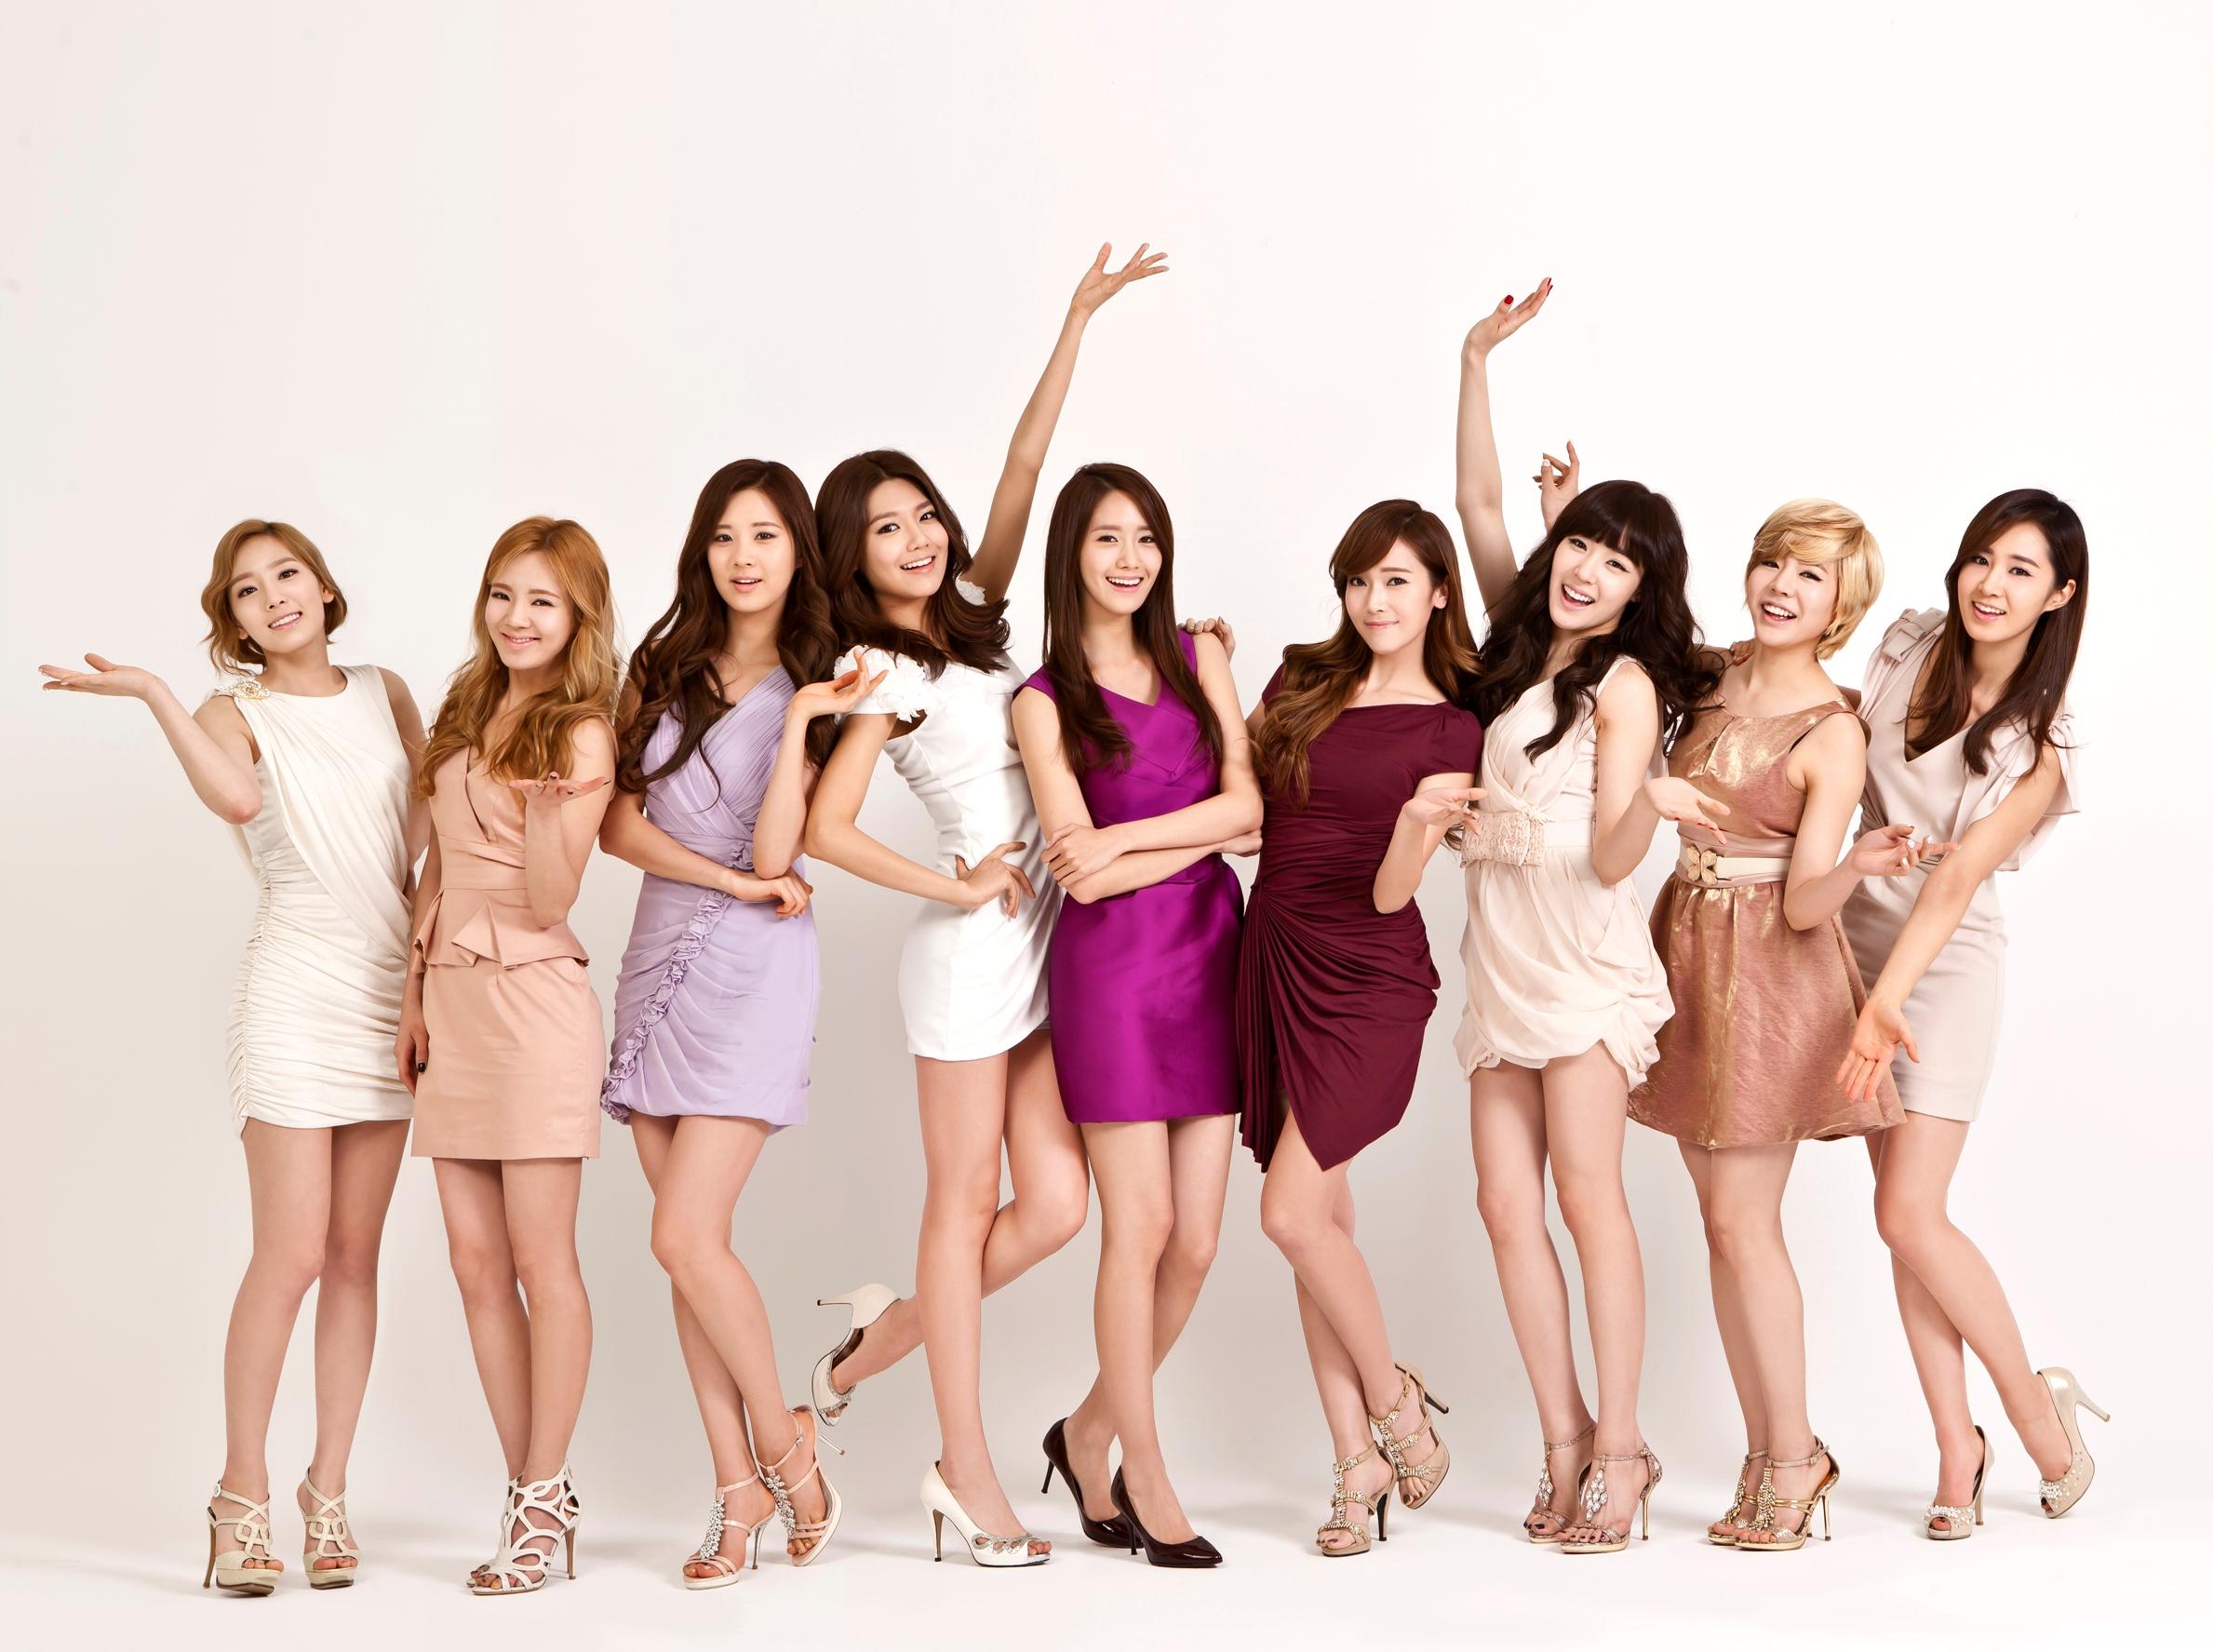 LG_시네마_3D_TV_새_모델_'소녀시대'_영입